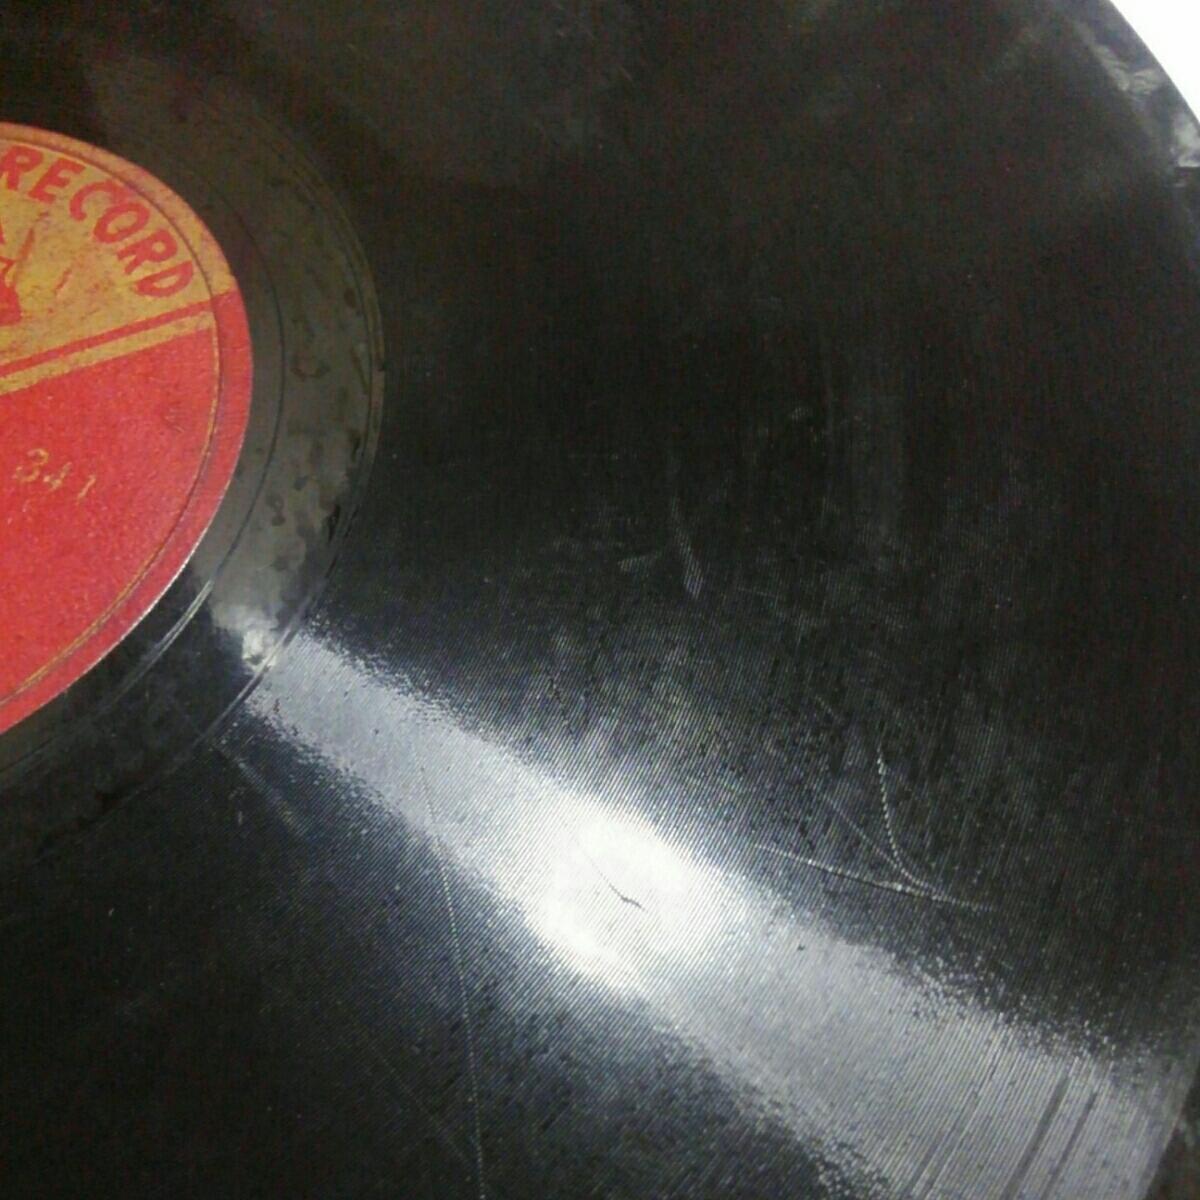 SP盤10吋インチ)小畑実 長崎のザボン売り/三門順子 東京ユンタ 昭和23年_画像2